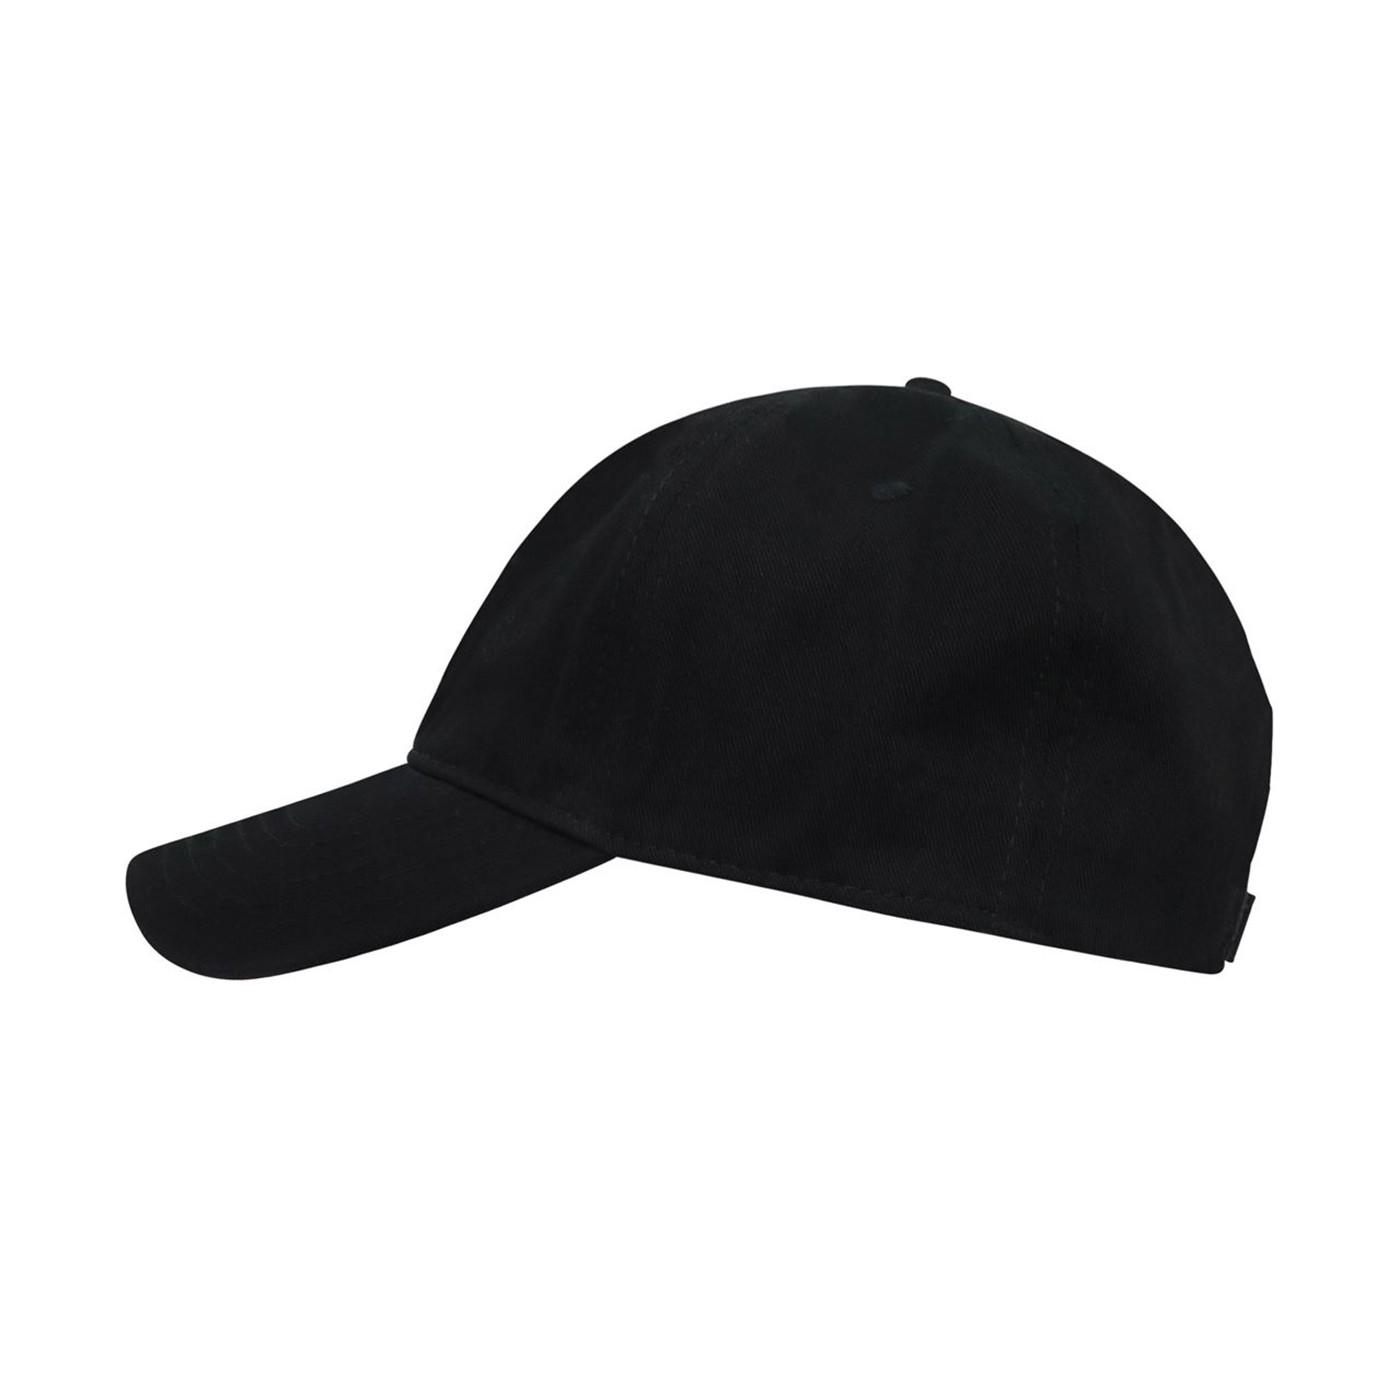 Black Panther Logo Adjustable Low Profile Hat